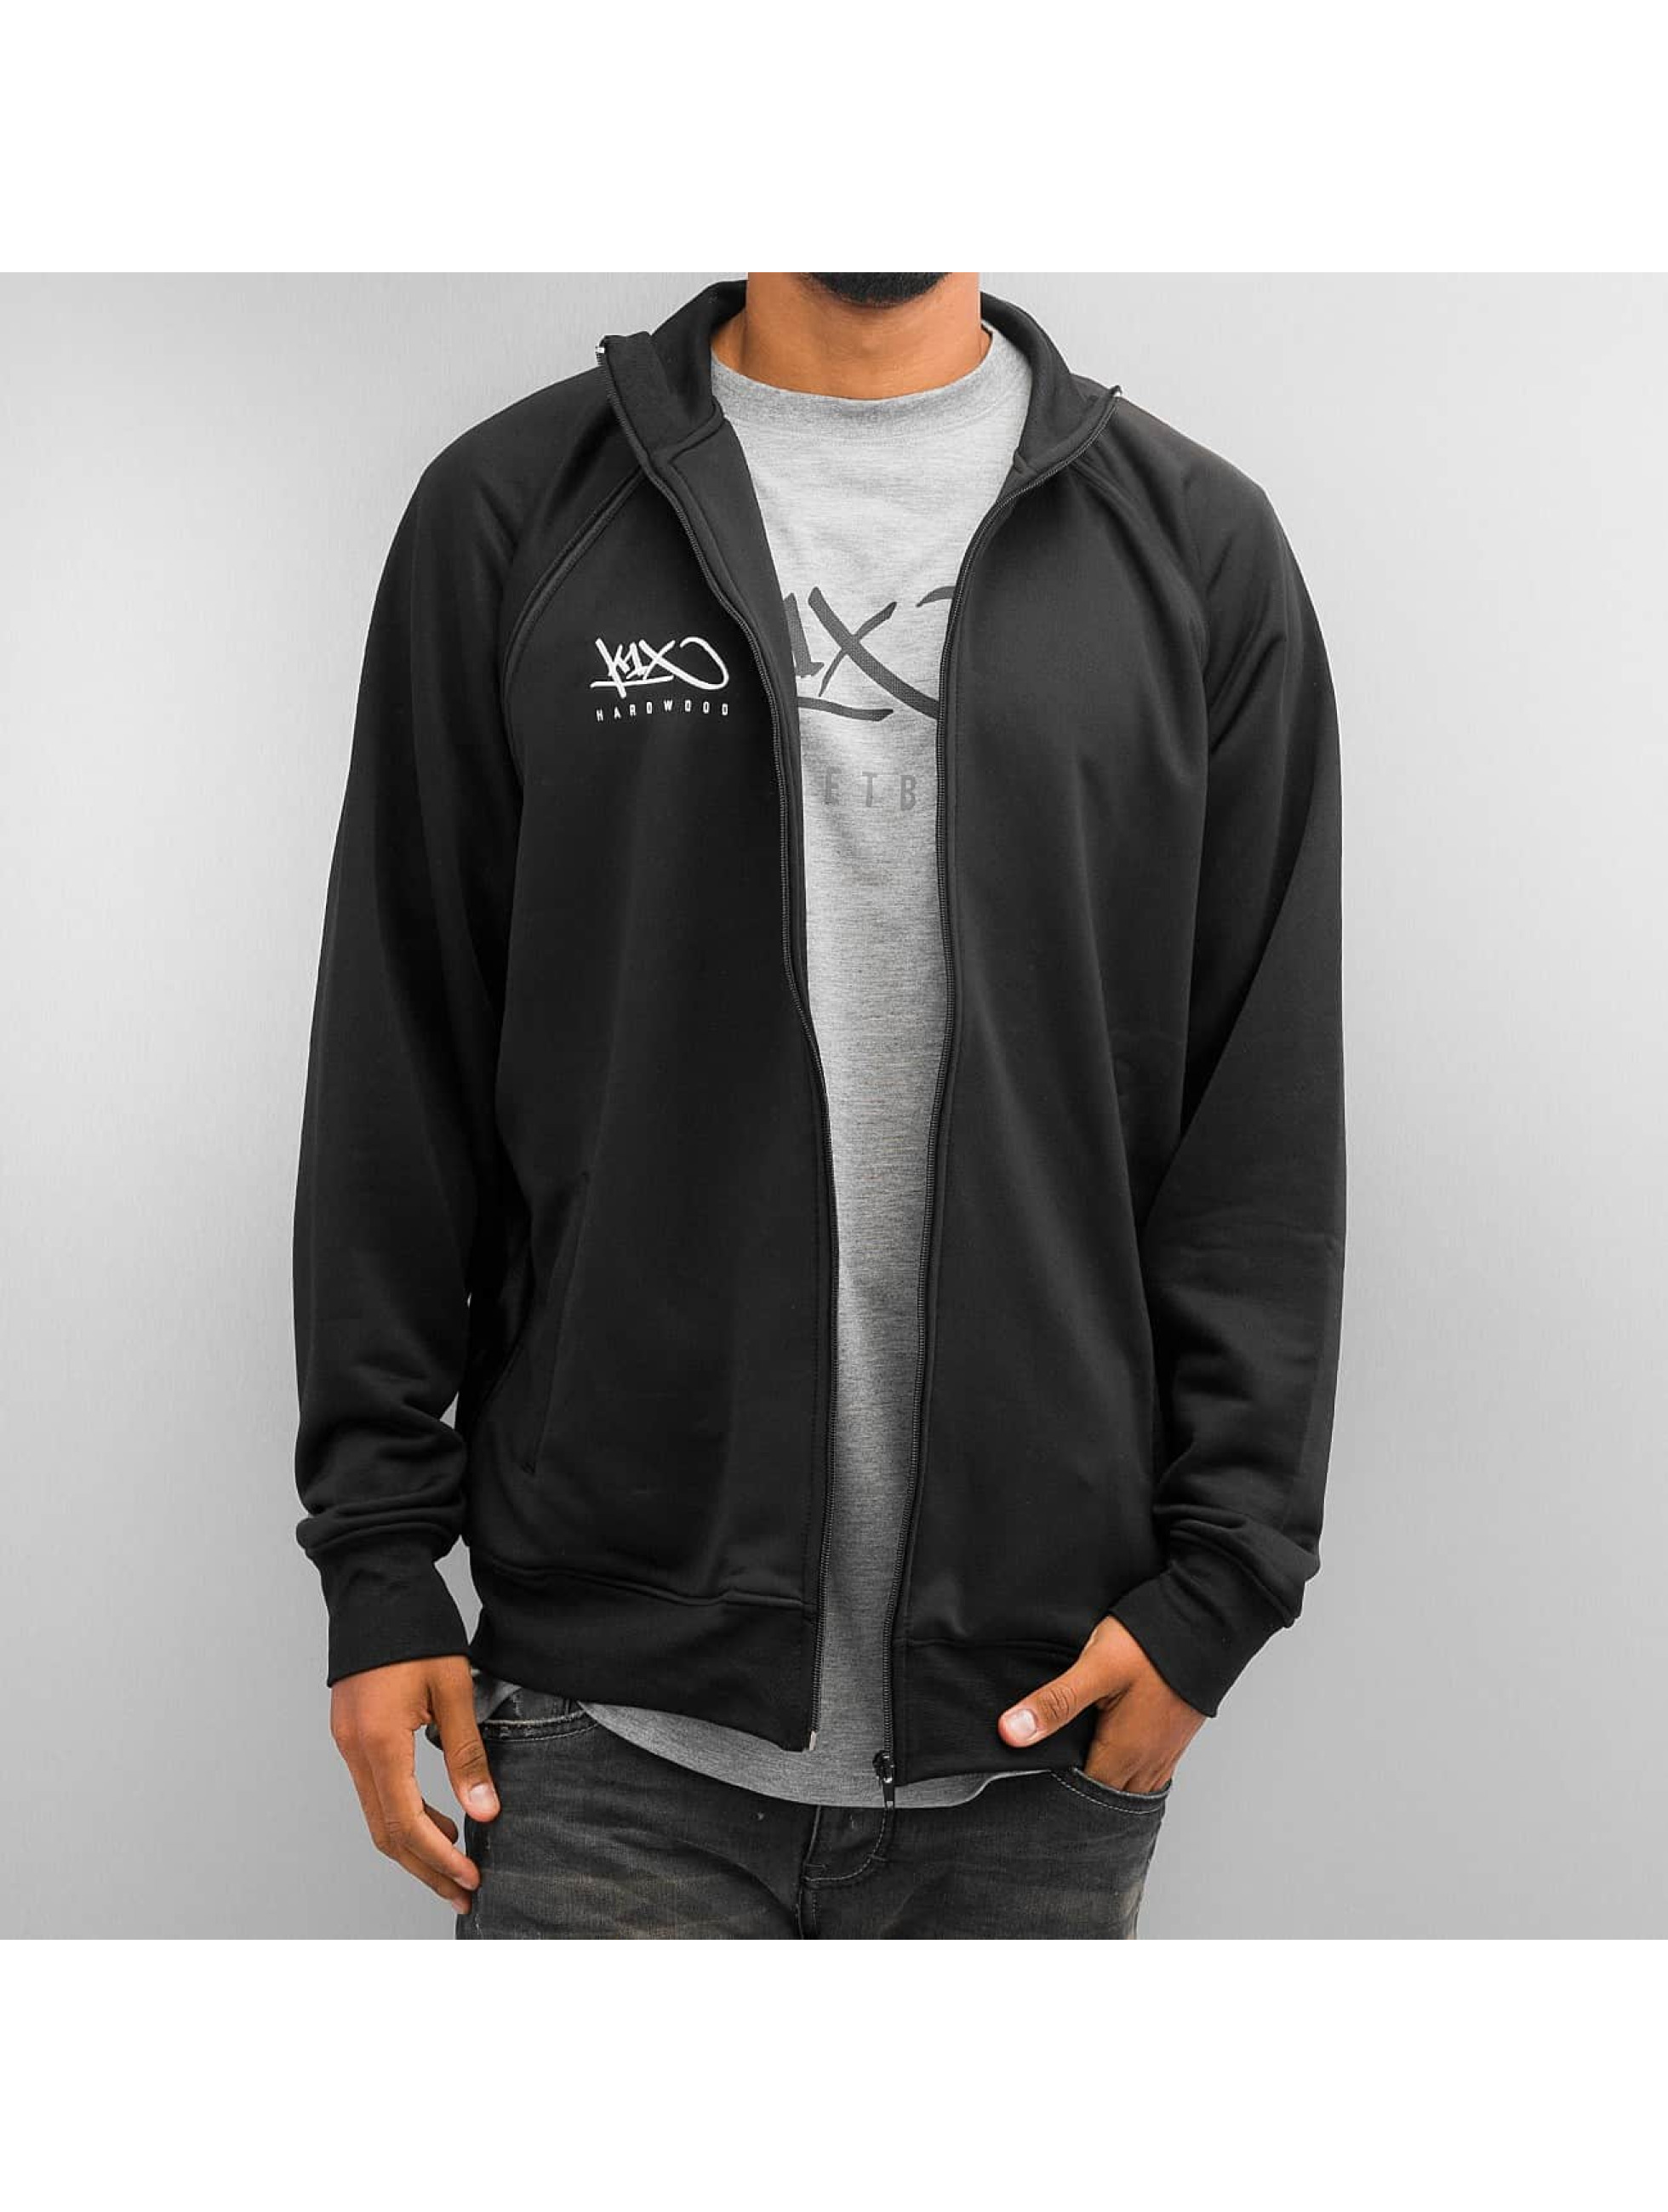 K1X Männer Übergangsjacke Hardwood Intimidator Warm Up in schwarz